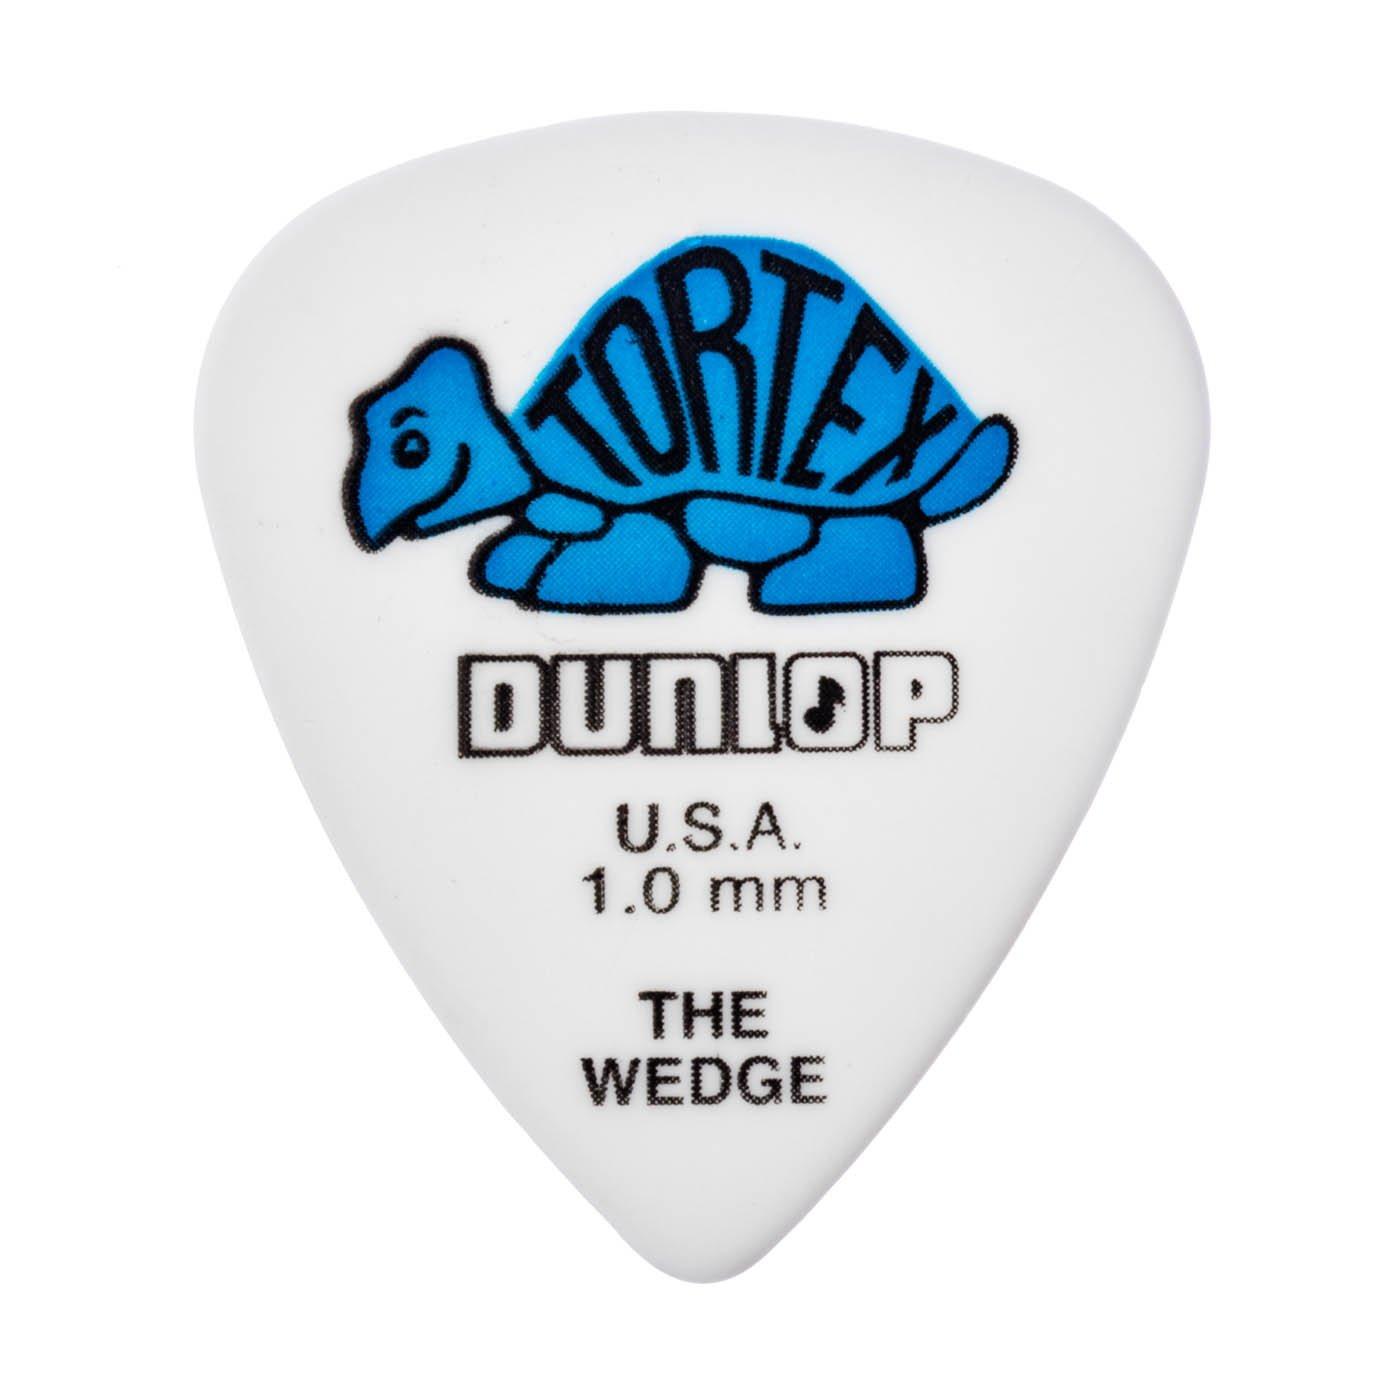 DUNLOP TORTEX WEDGE 1.0 PICKS 12pk